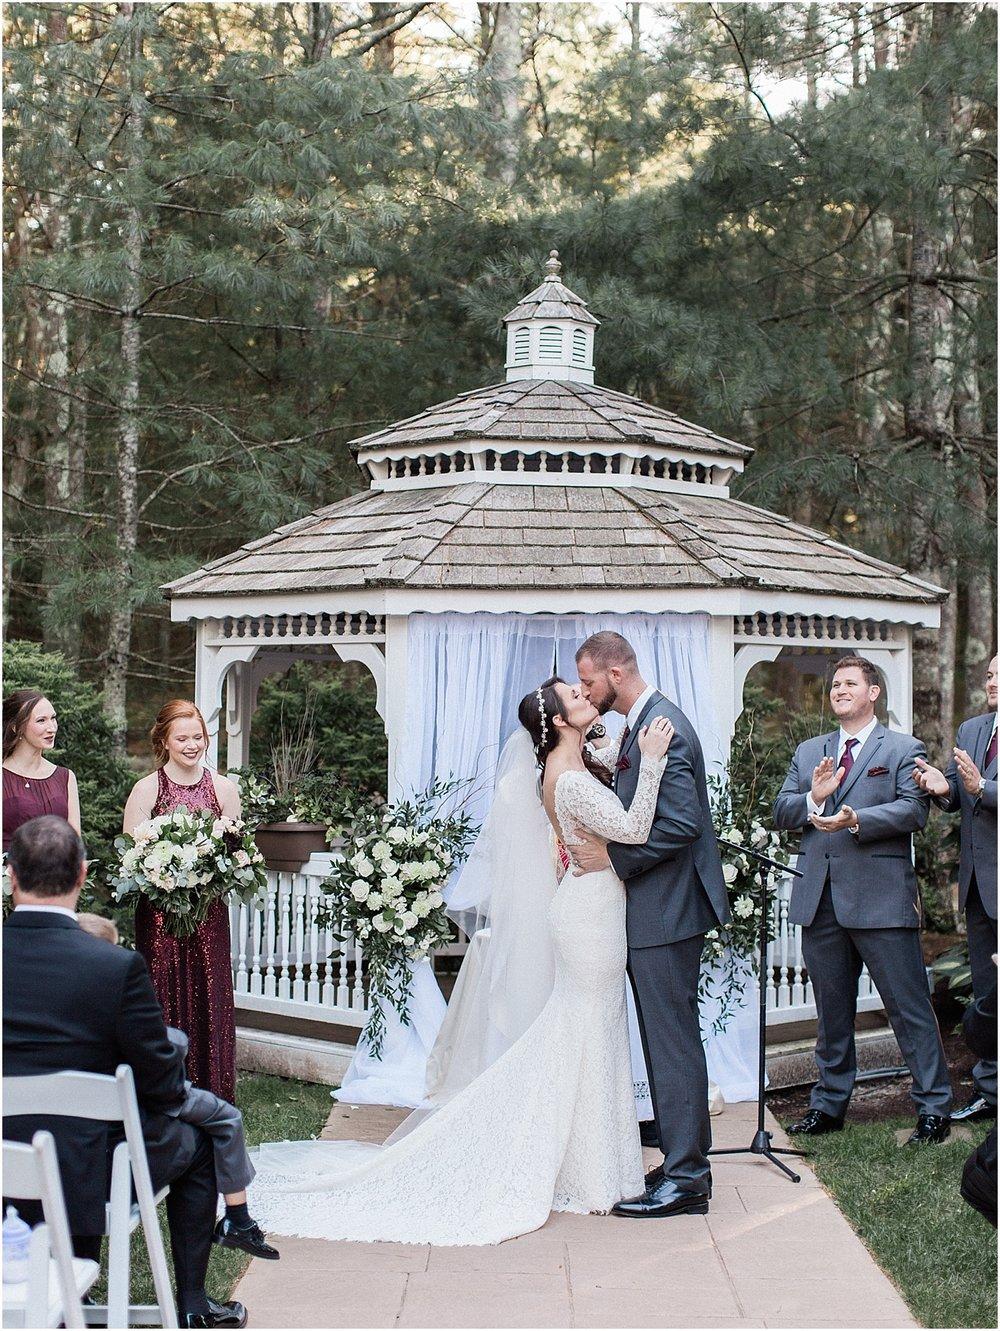 christina_frank_the_pavilion_at_pine_hills_fall_wine_cape_cod_boston_wedding_photographer_meredith_jane_photography_photo_1266.jpg